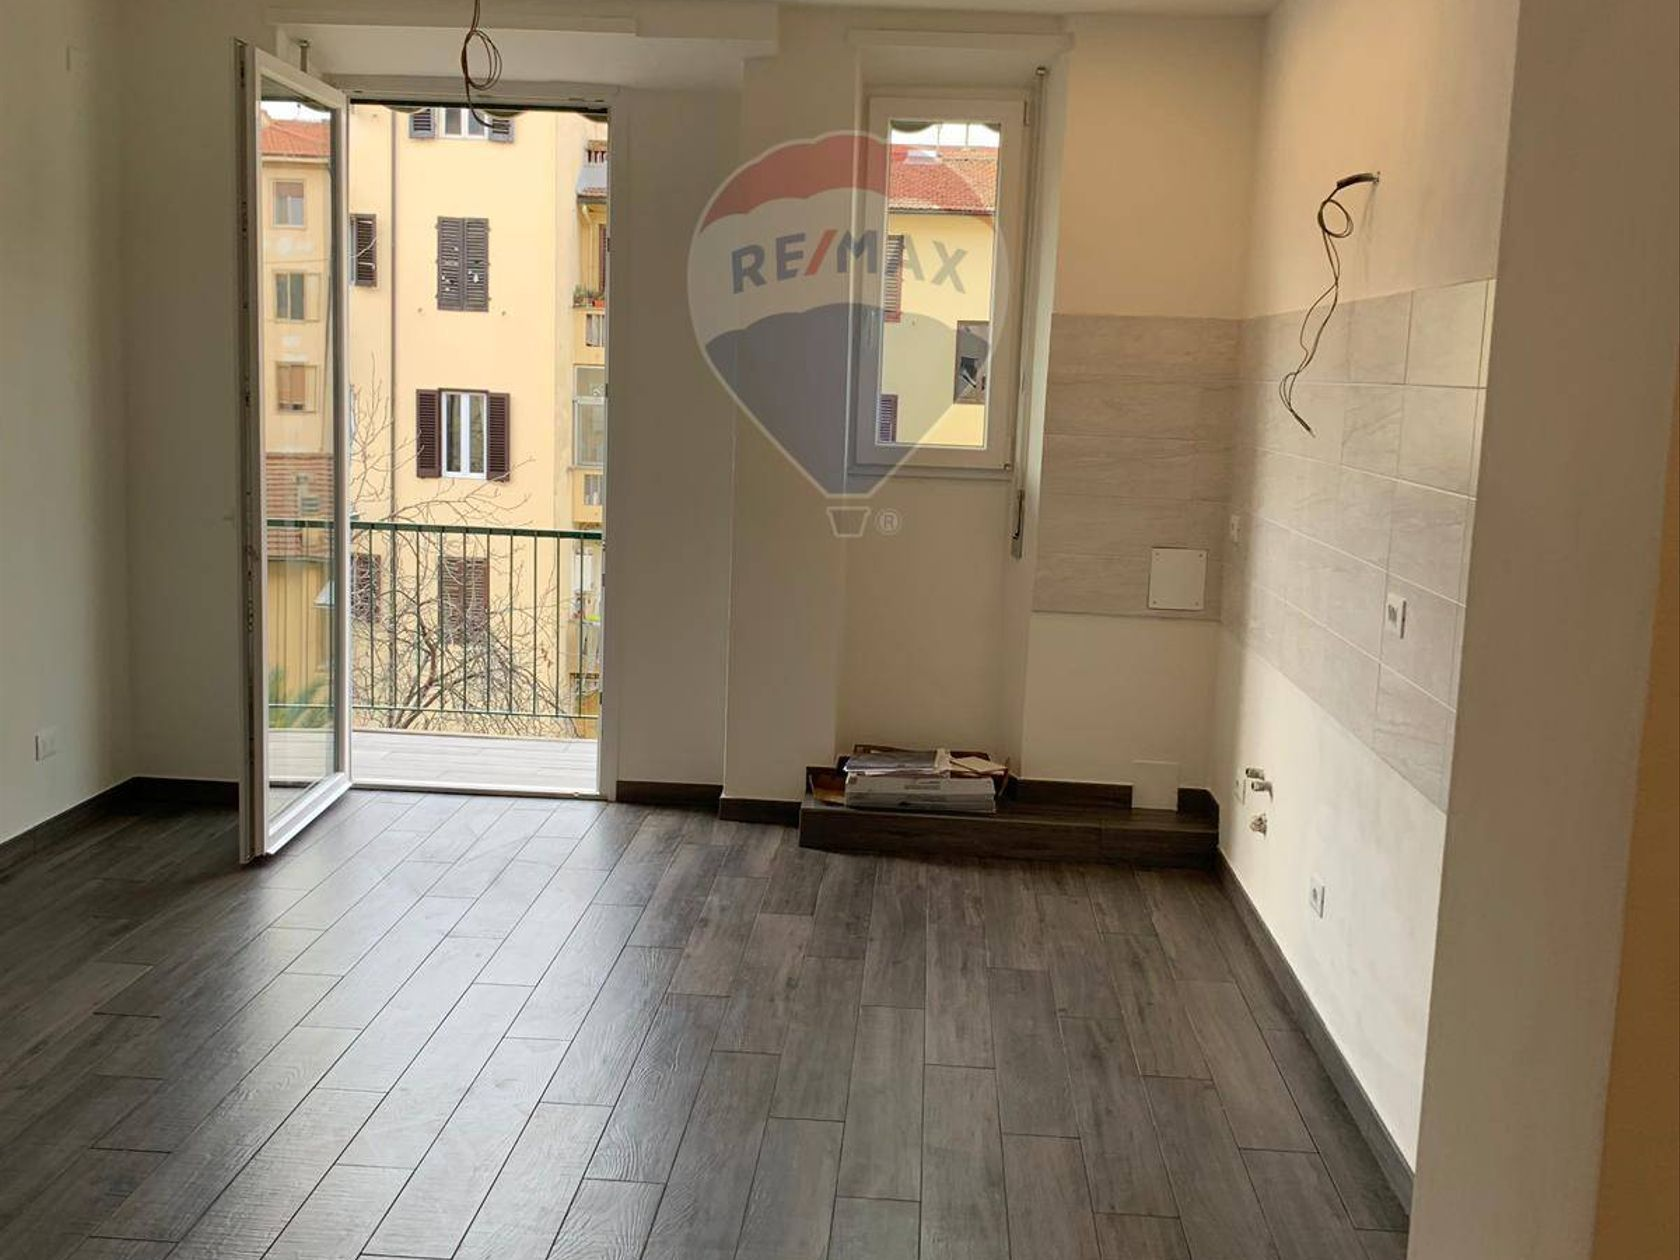 Appartamento San Iacopino, Firenze, FI Vendita - Foto 6